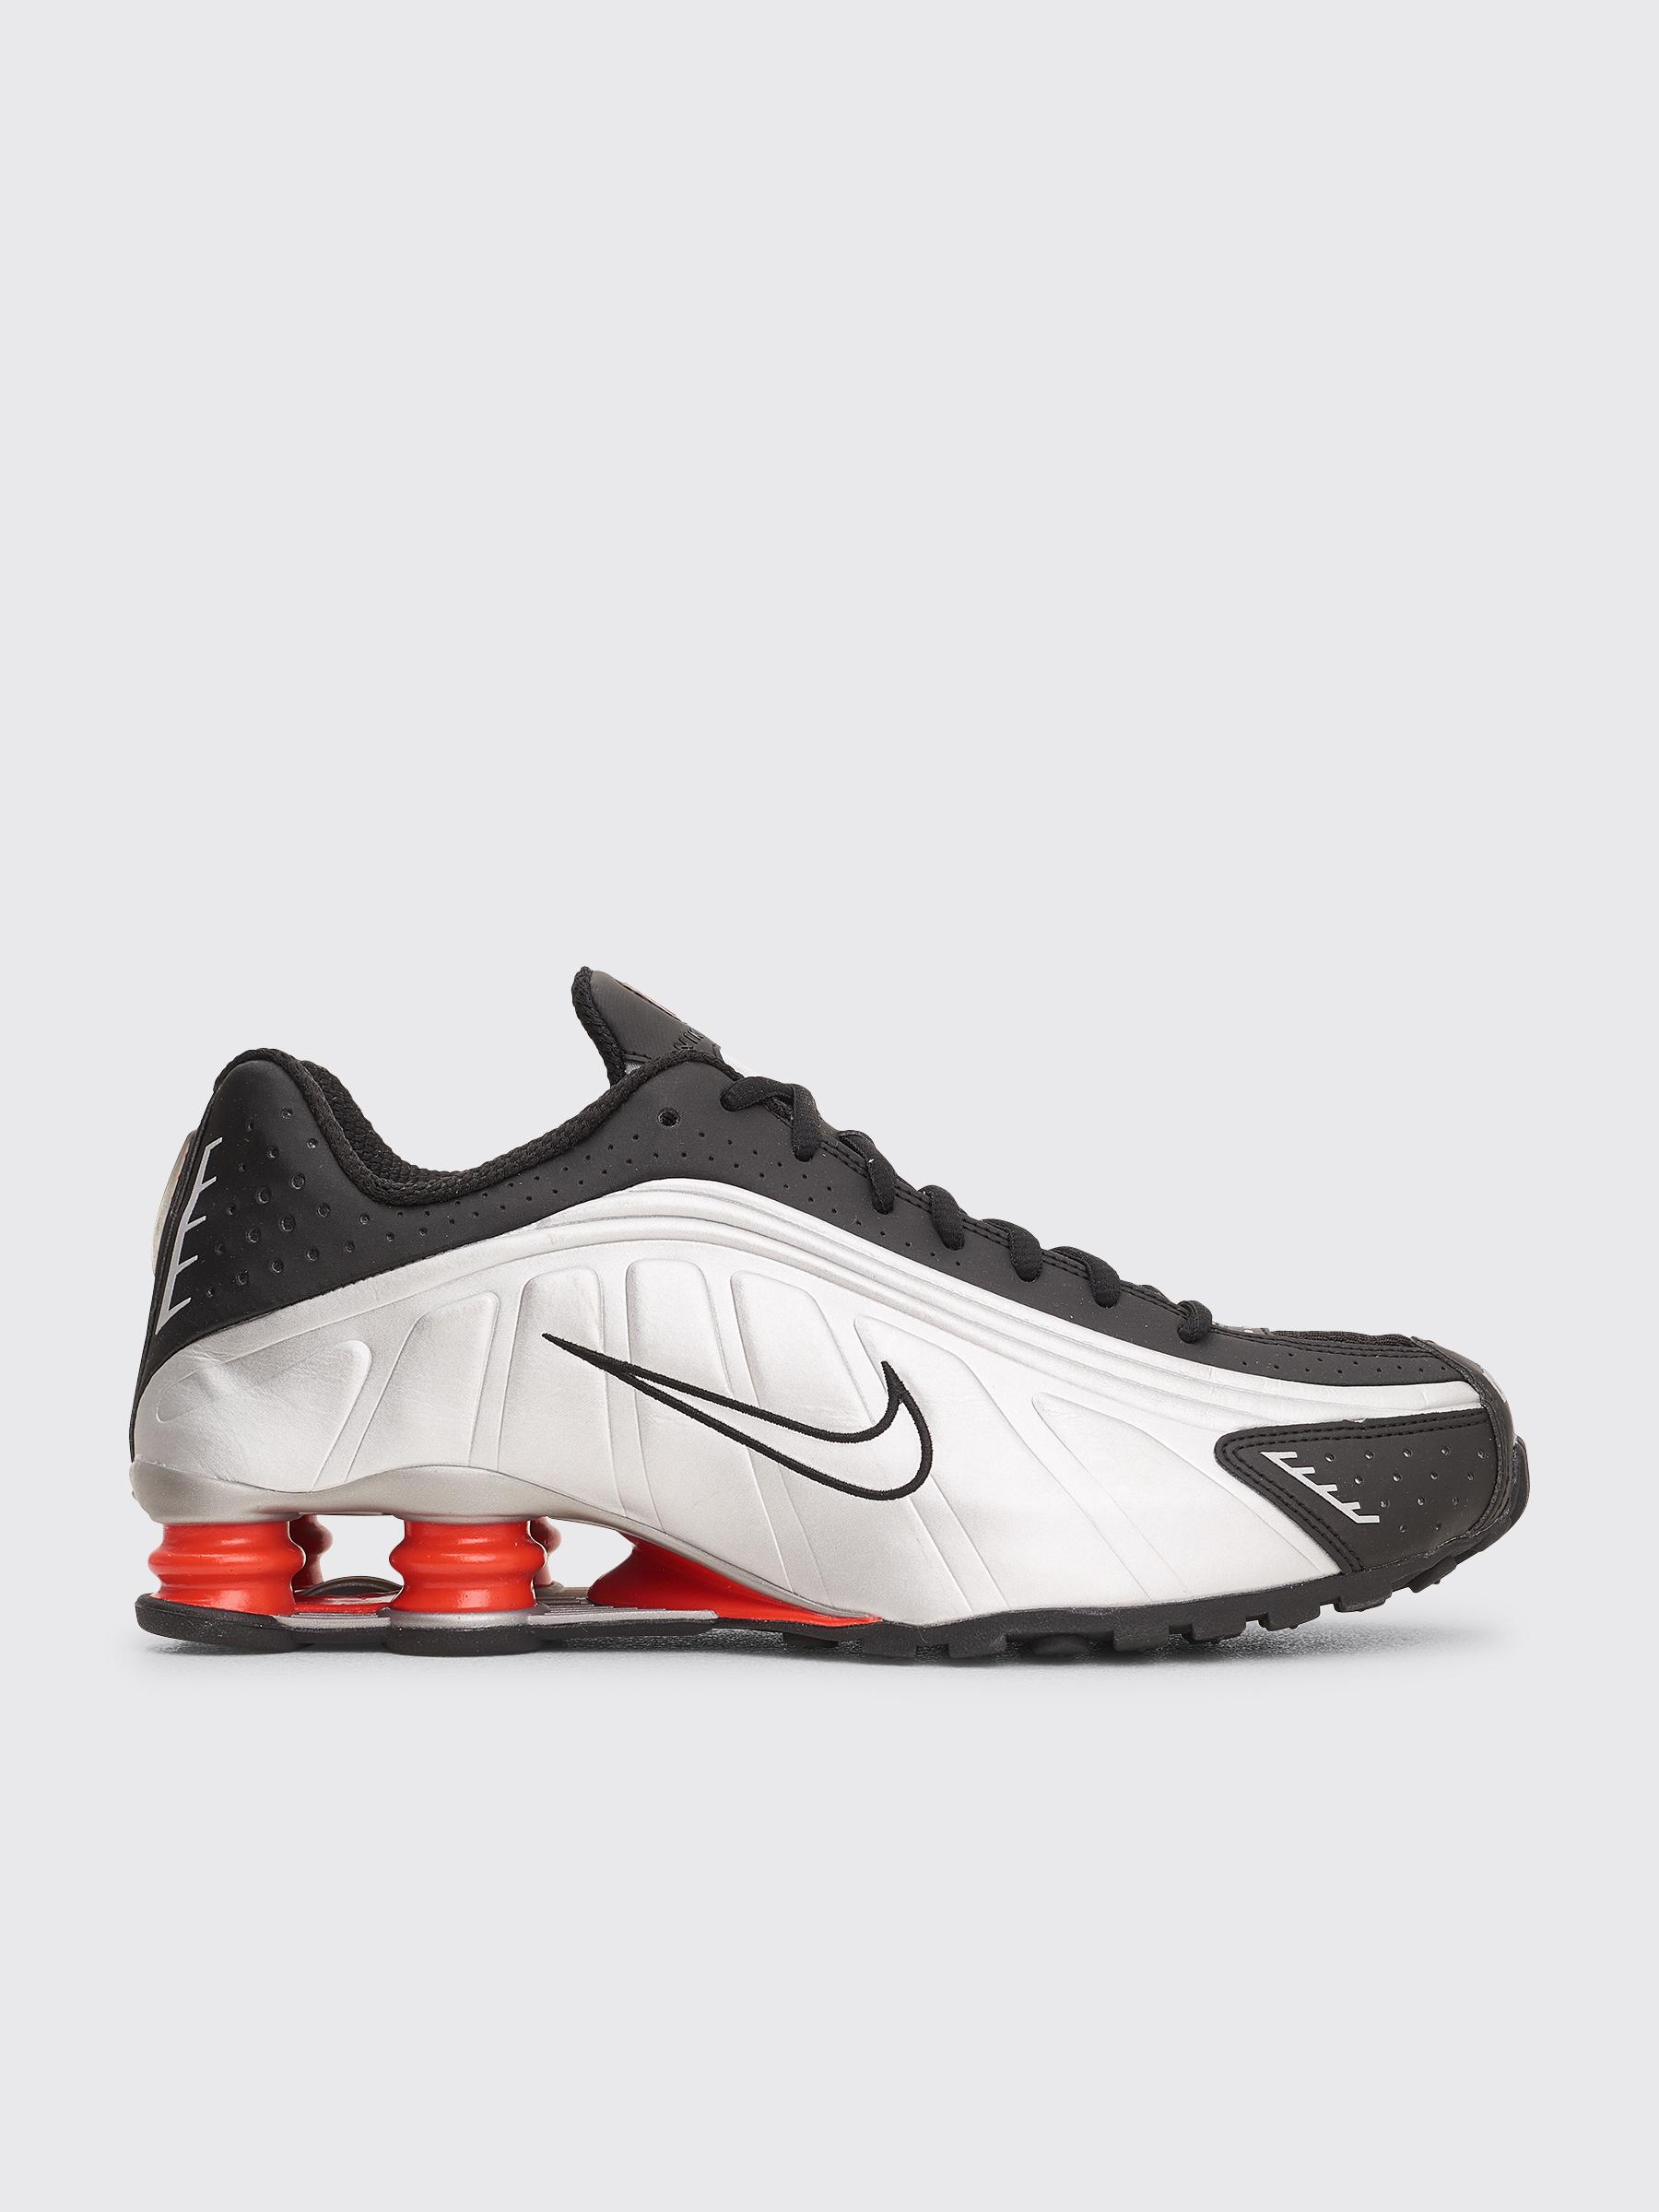 e95585f8f62a1 Très Bien - Nike Sportswear Shox R4 Black   Metallic Silver